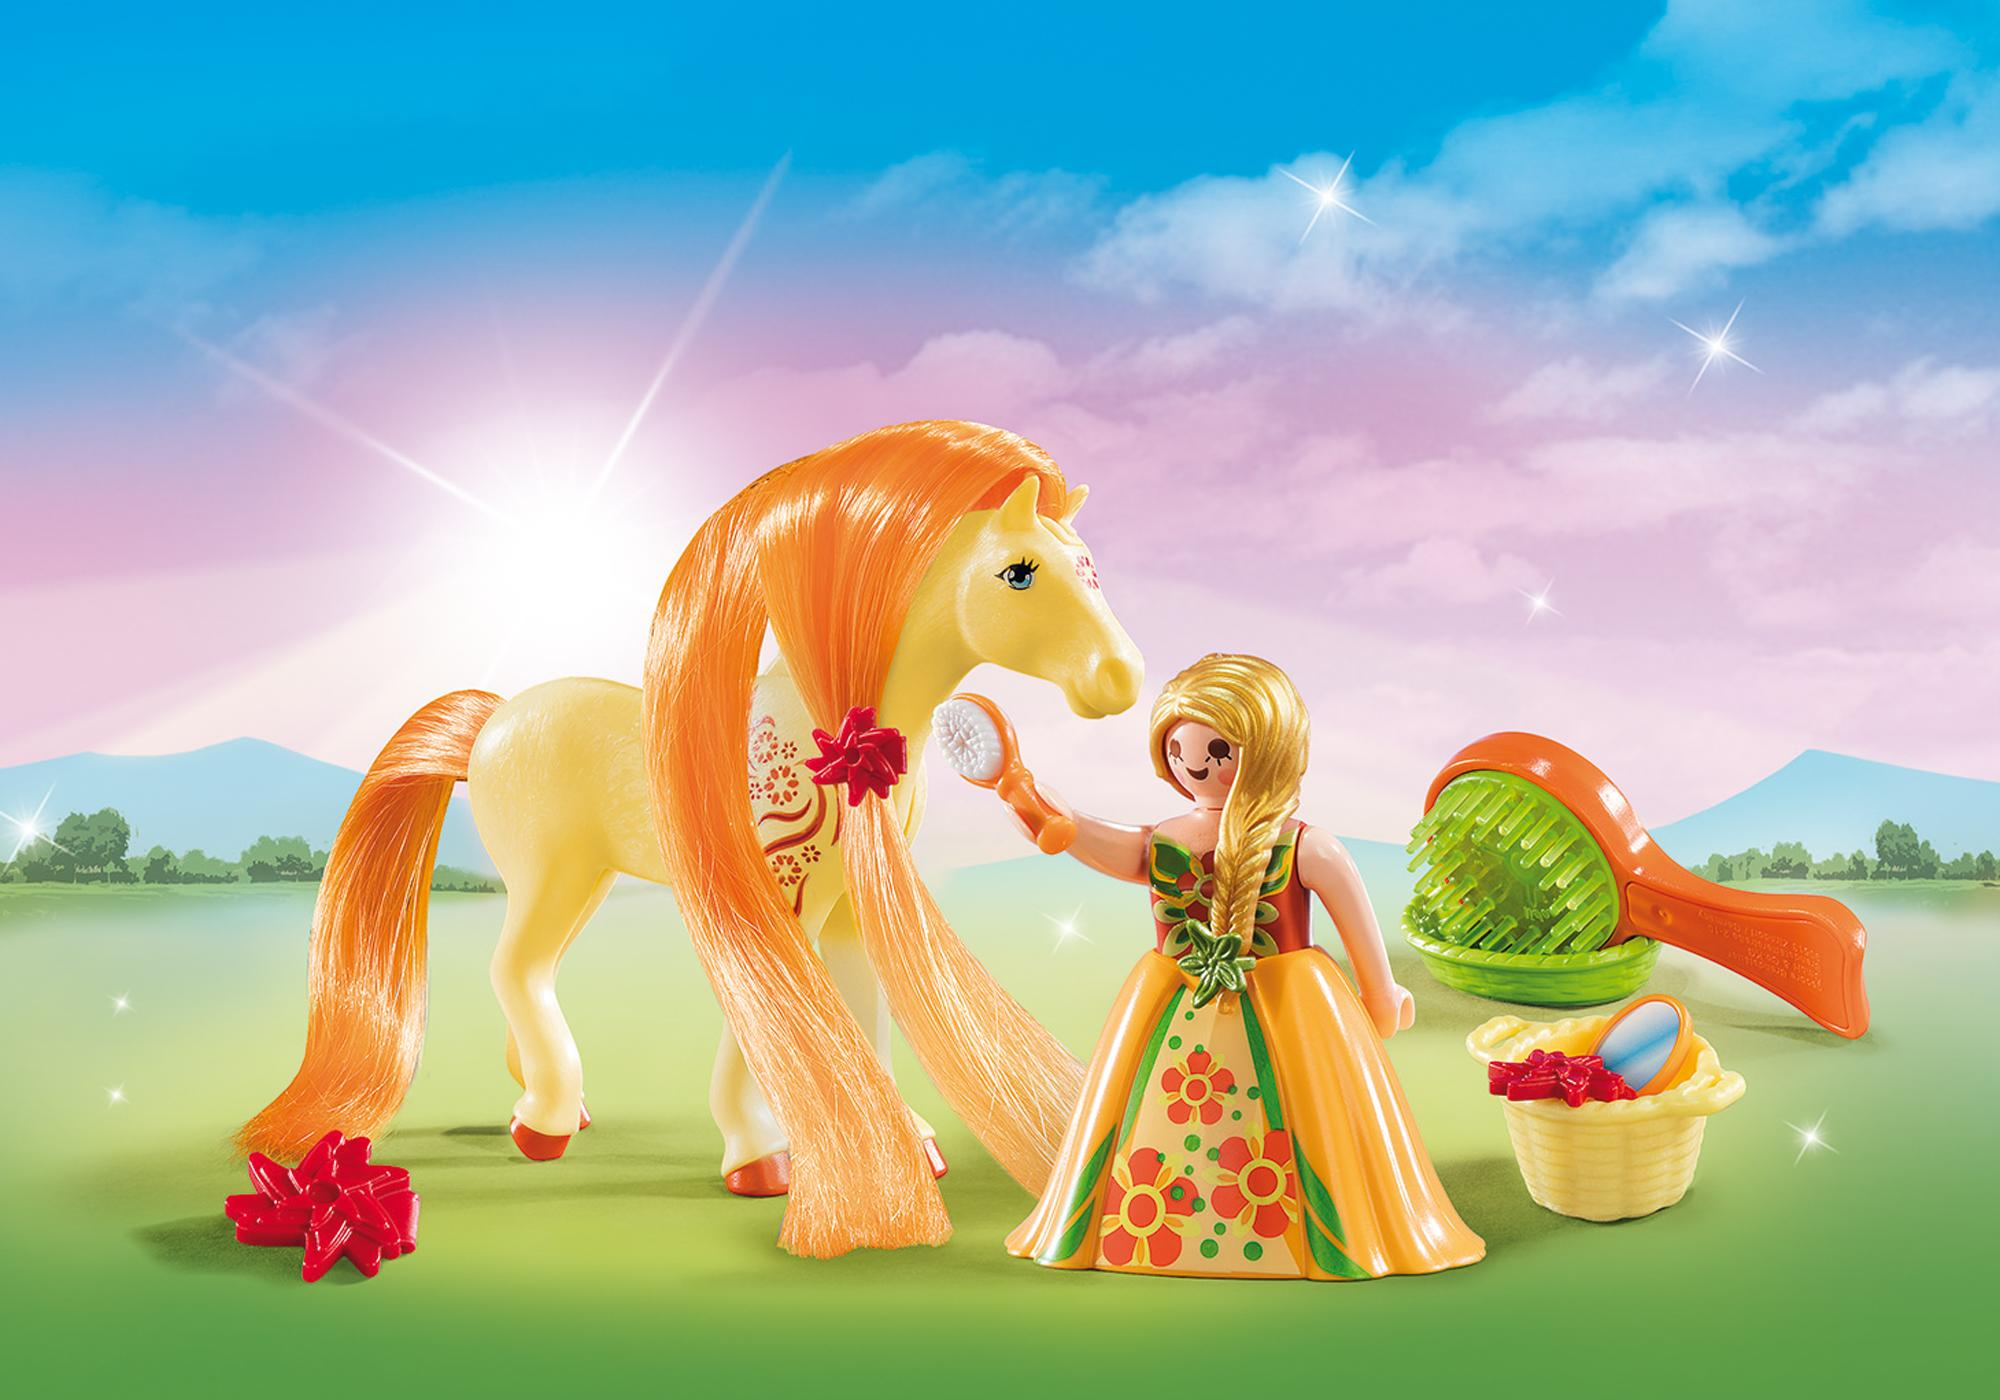 5656_product_detail/Maleta grande Princesa com Cavalo